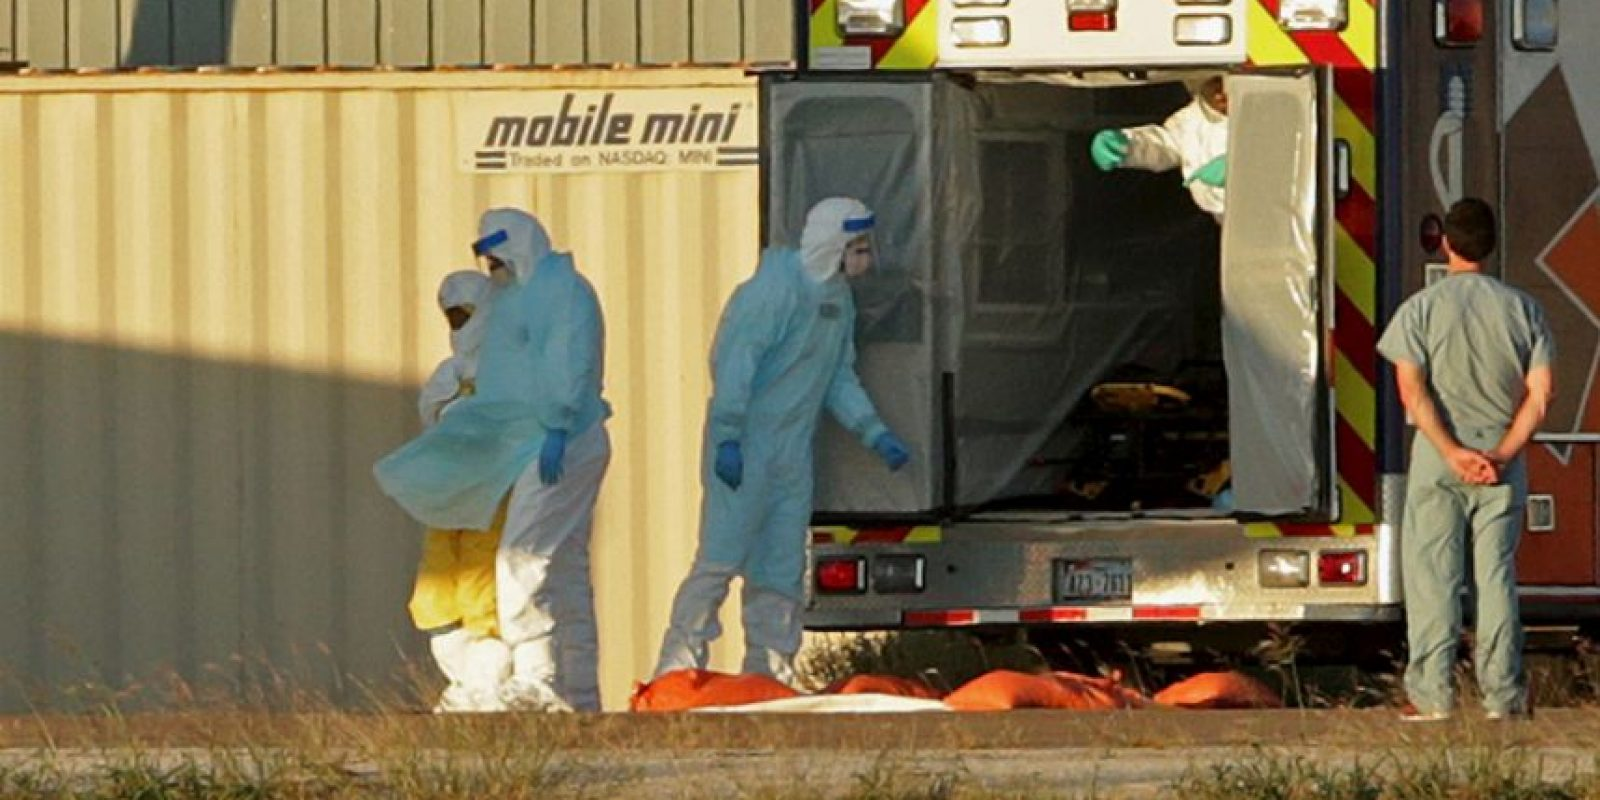 Este virus causó la muerte de 11 mil 005 personas en diversos países de África Occidental, como Sierra Leona, Liberia y Guinea. Foto:Getty Images